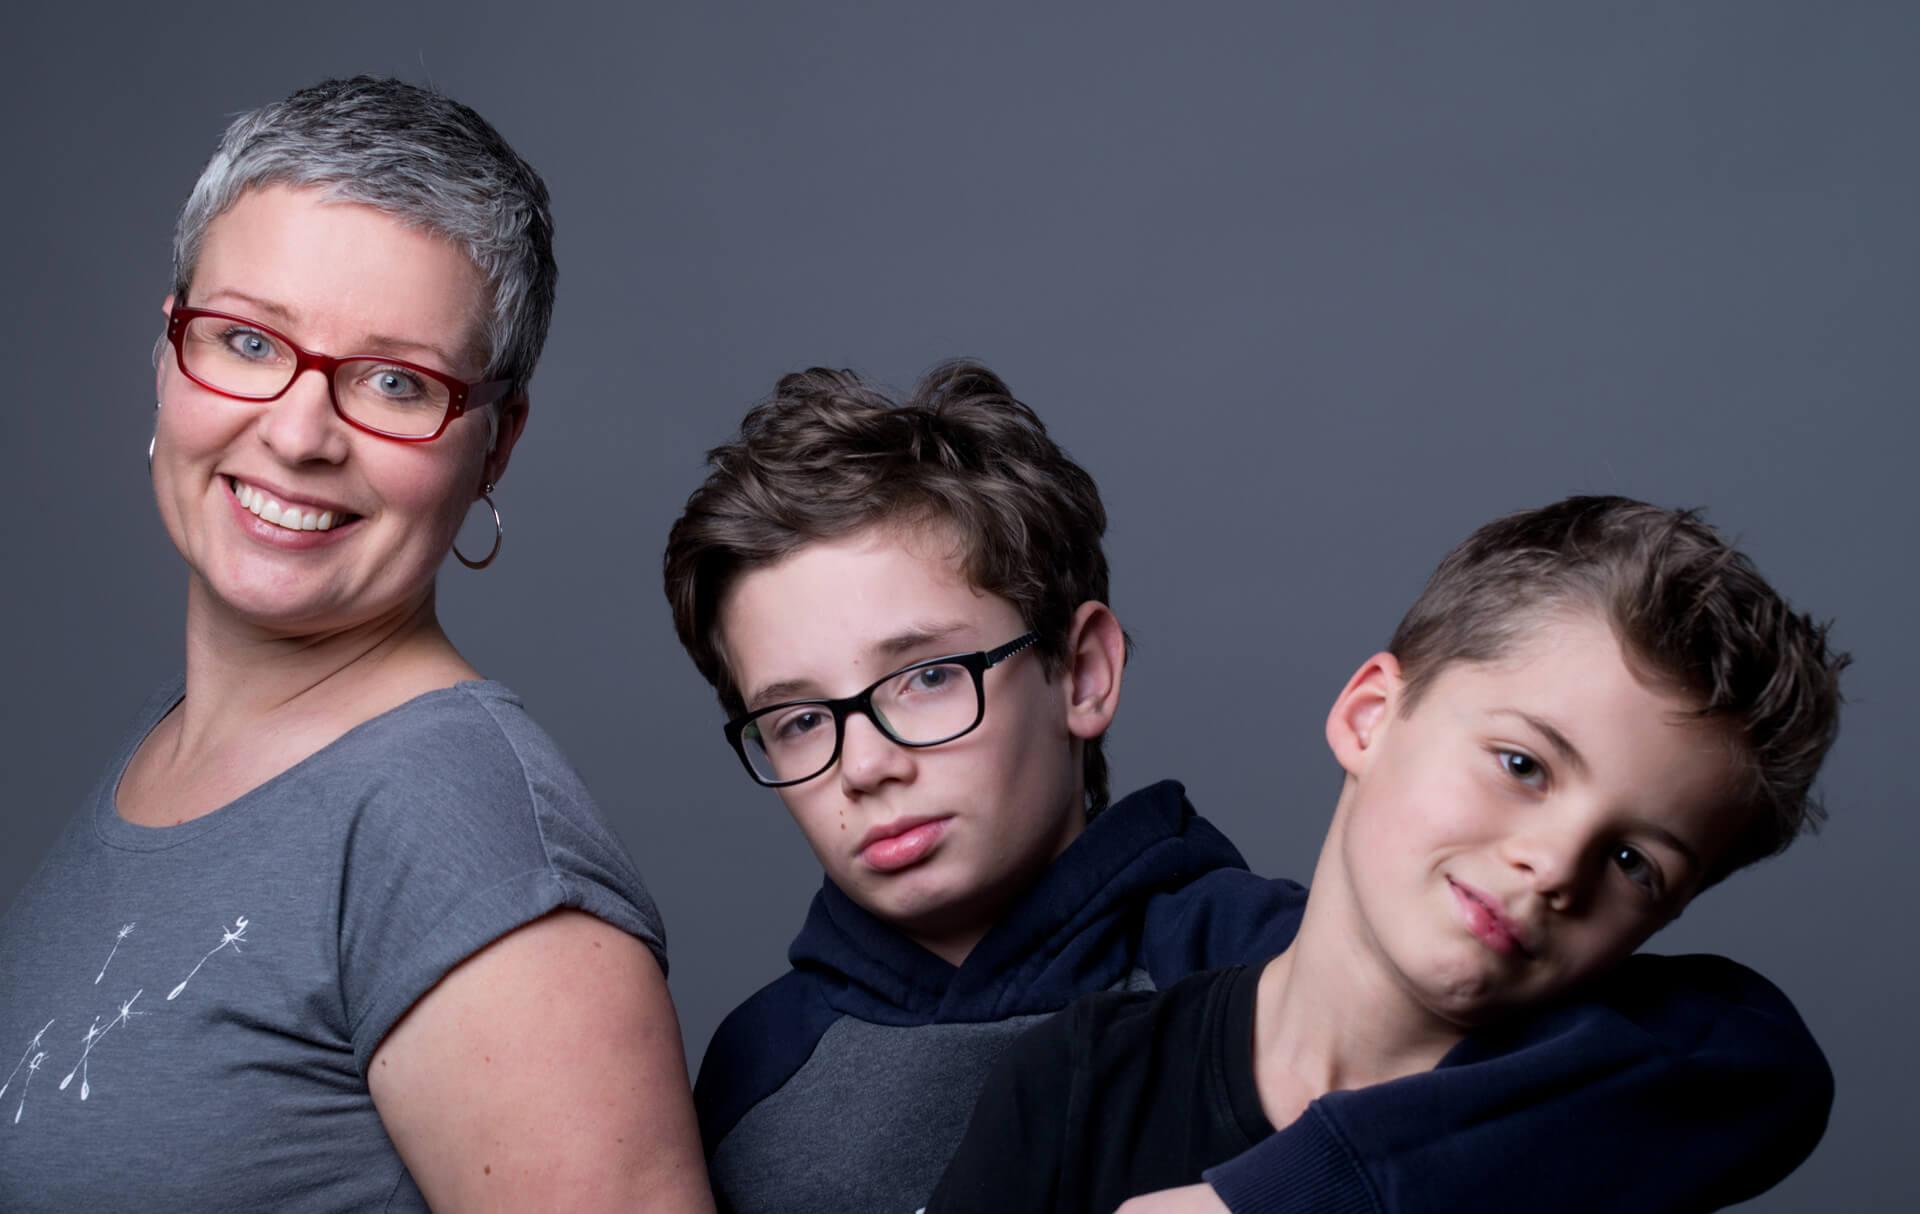 familienfotografie fotostudio Familie 2 Kinder mit Mama farbig